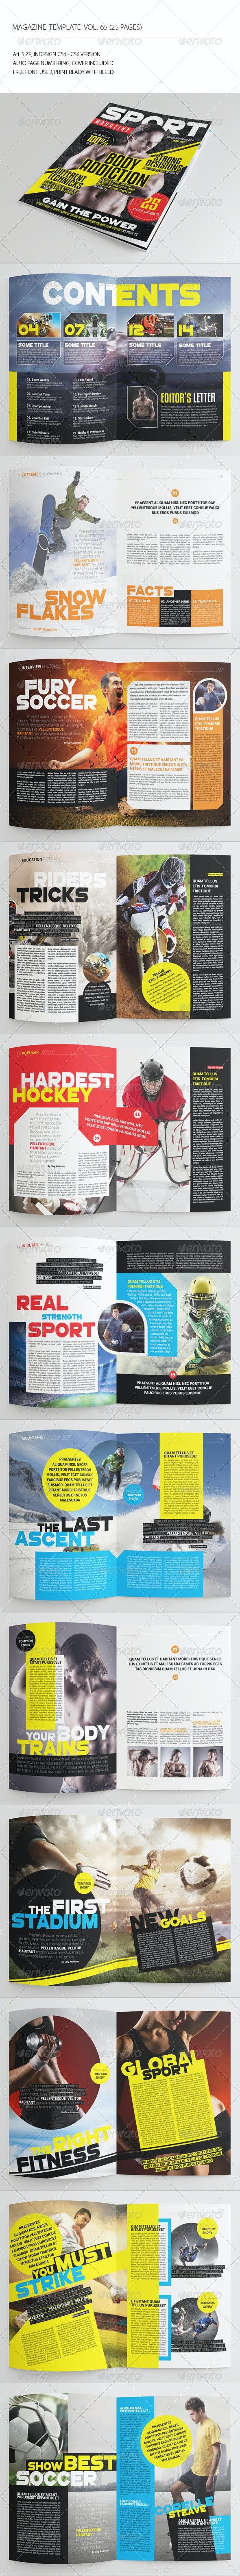 25 Pages Sport Magazine Vol65 - Magazines Print Templates